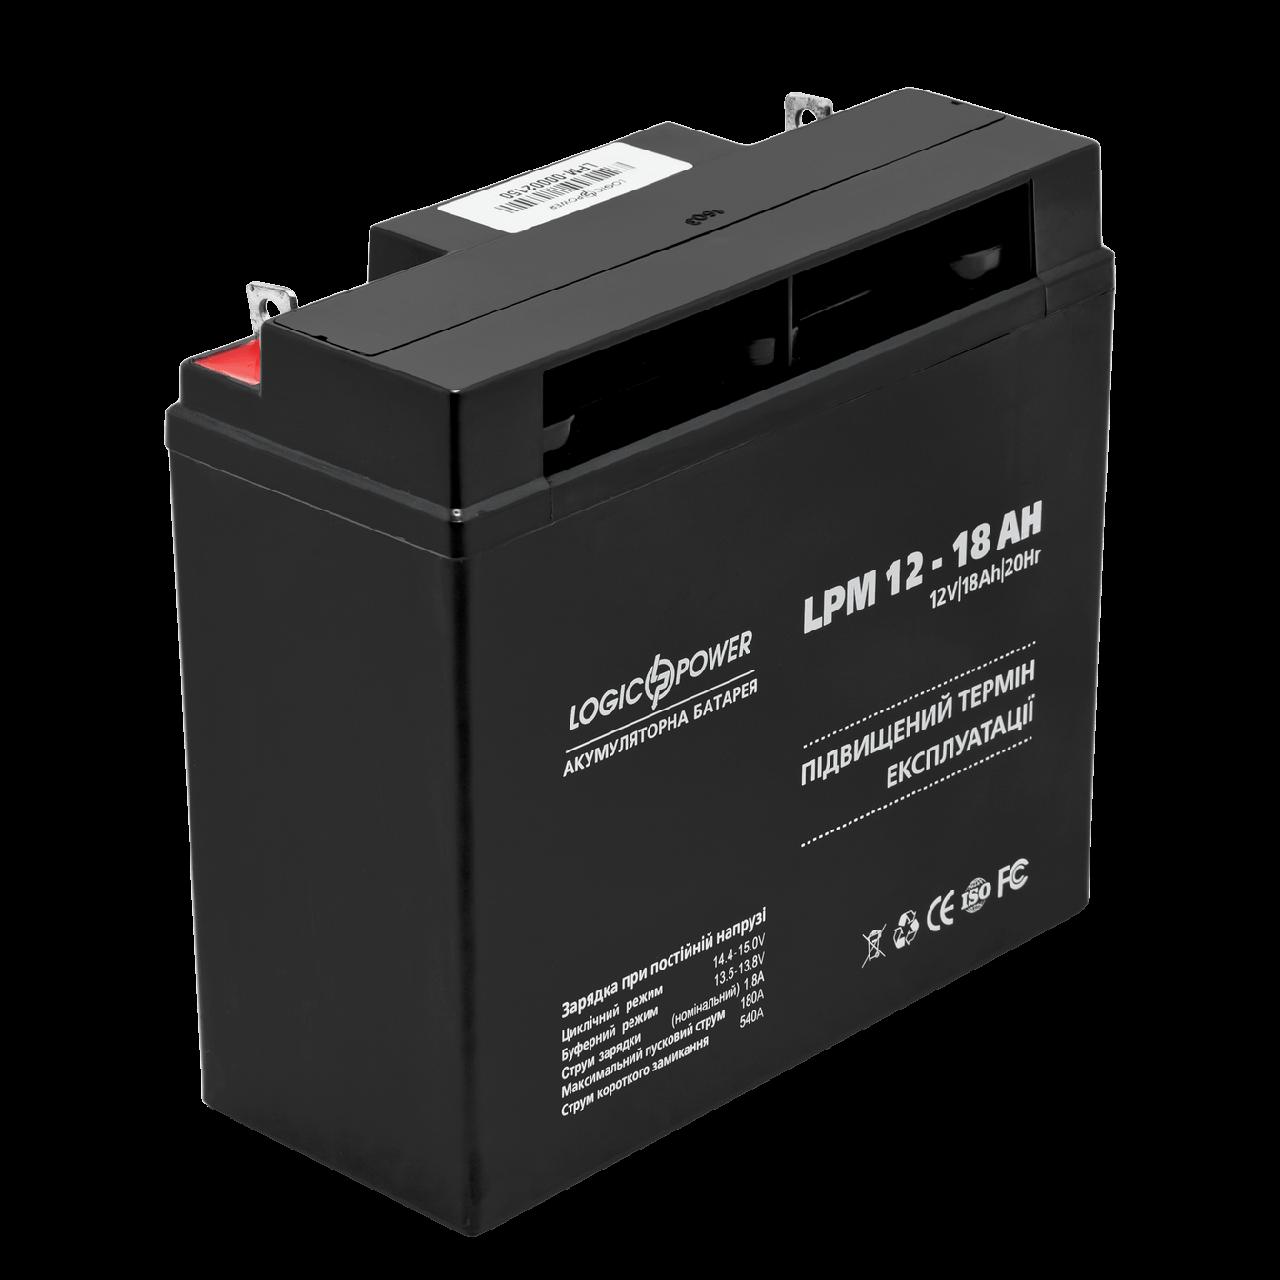 Аккумулятор LPM 12 - 18 AH